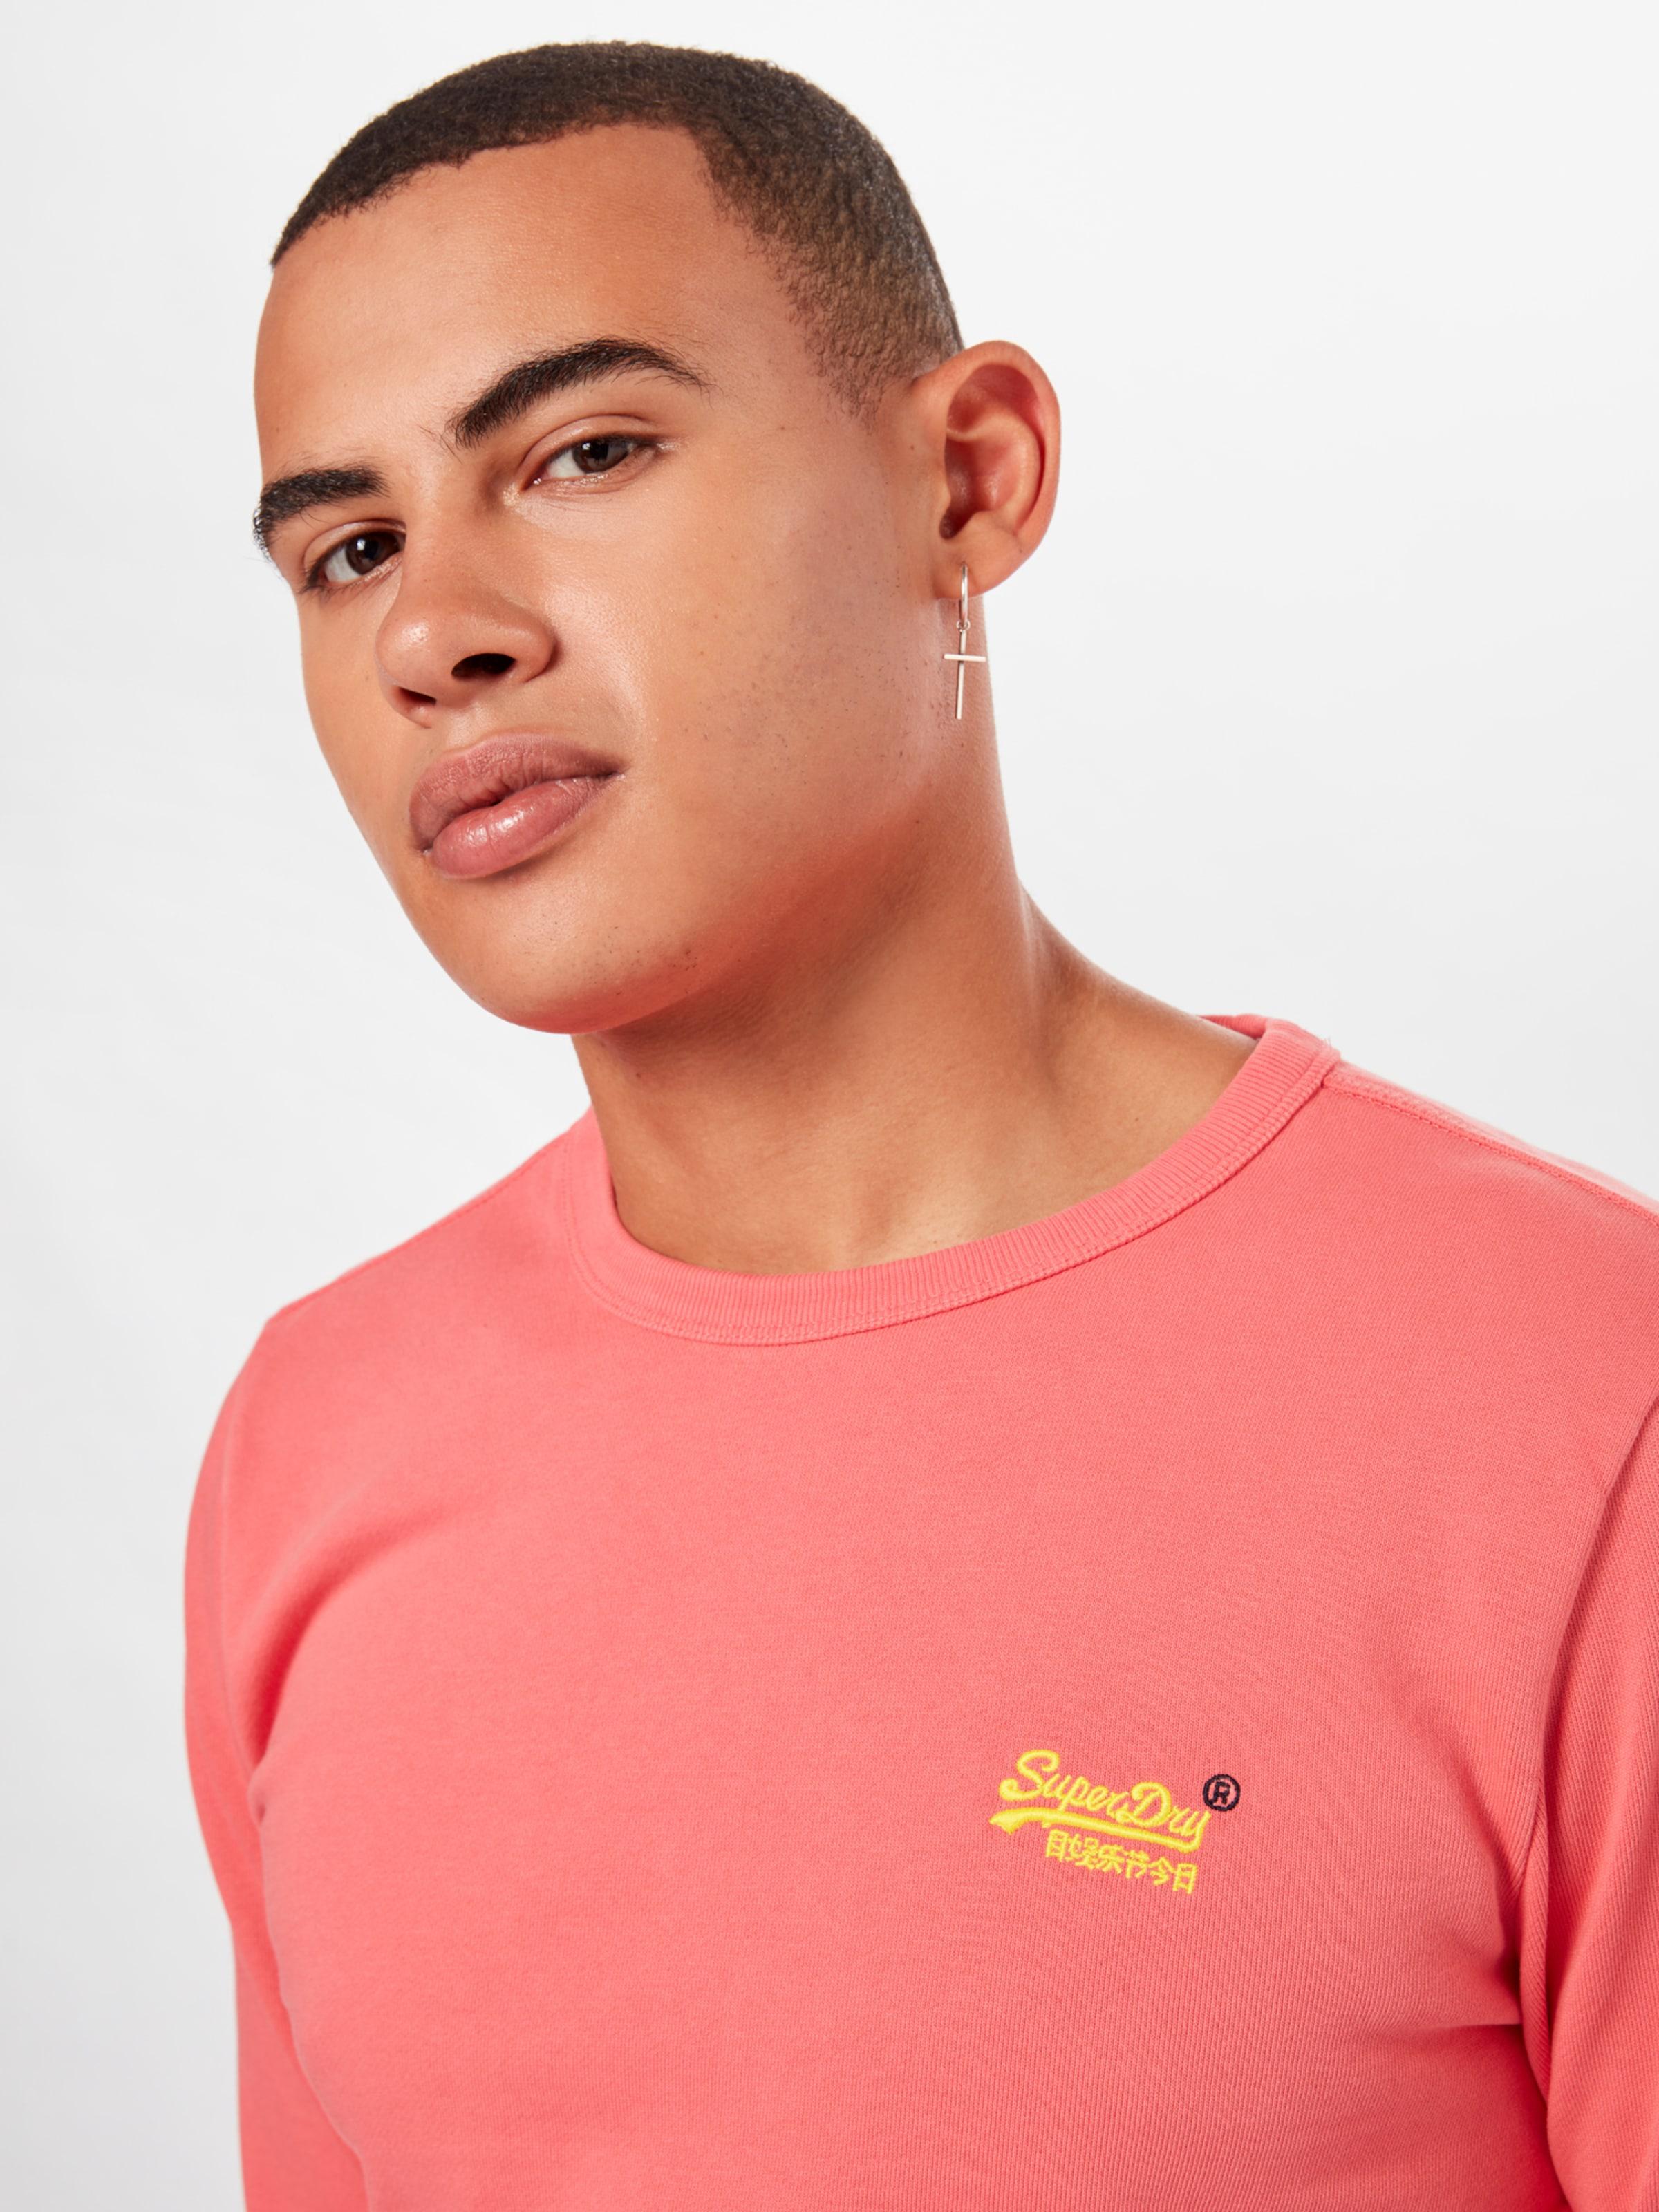 Label Turquoise Pastelline Sweat 'orange Superdry Crew' En shirt srdxBthQC